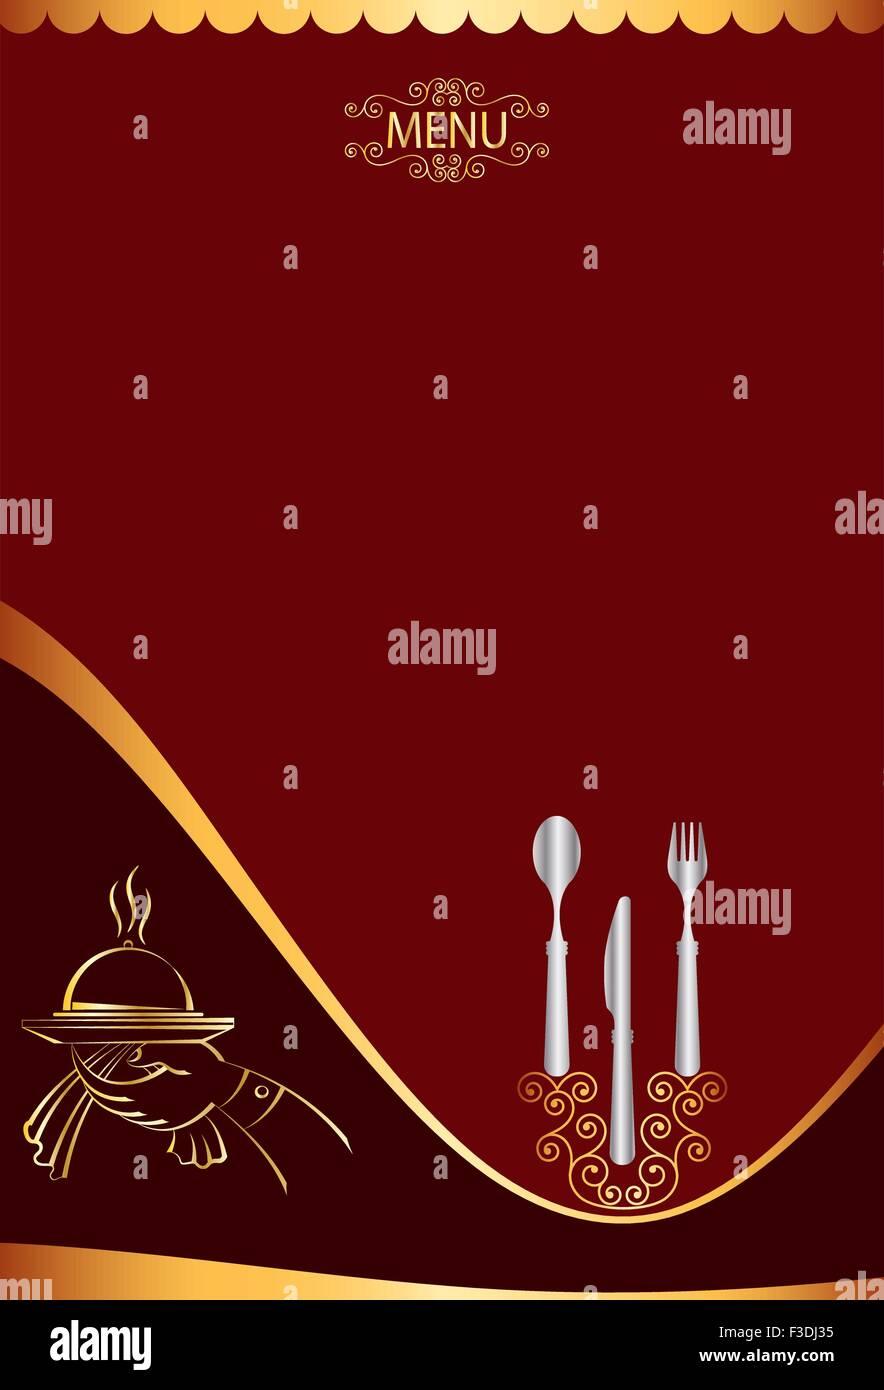 Menu Card Design Template Vector Art Stock Vector Art